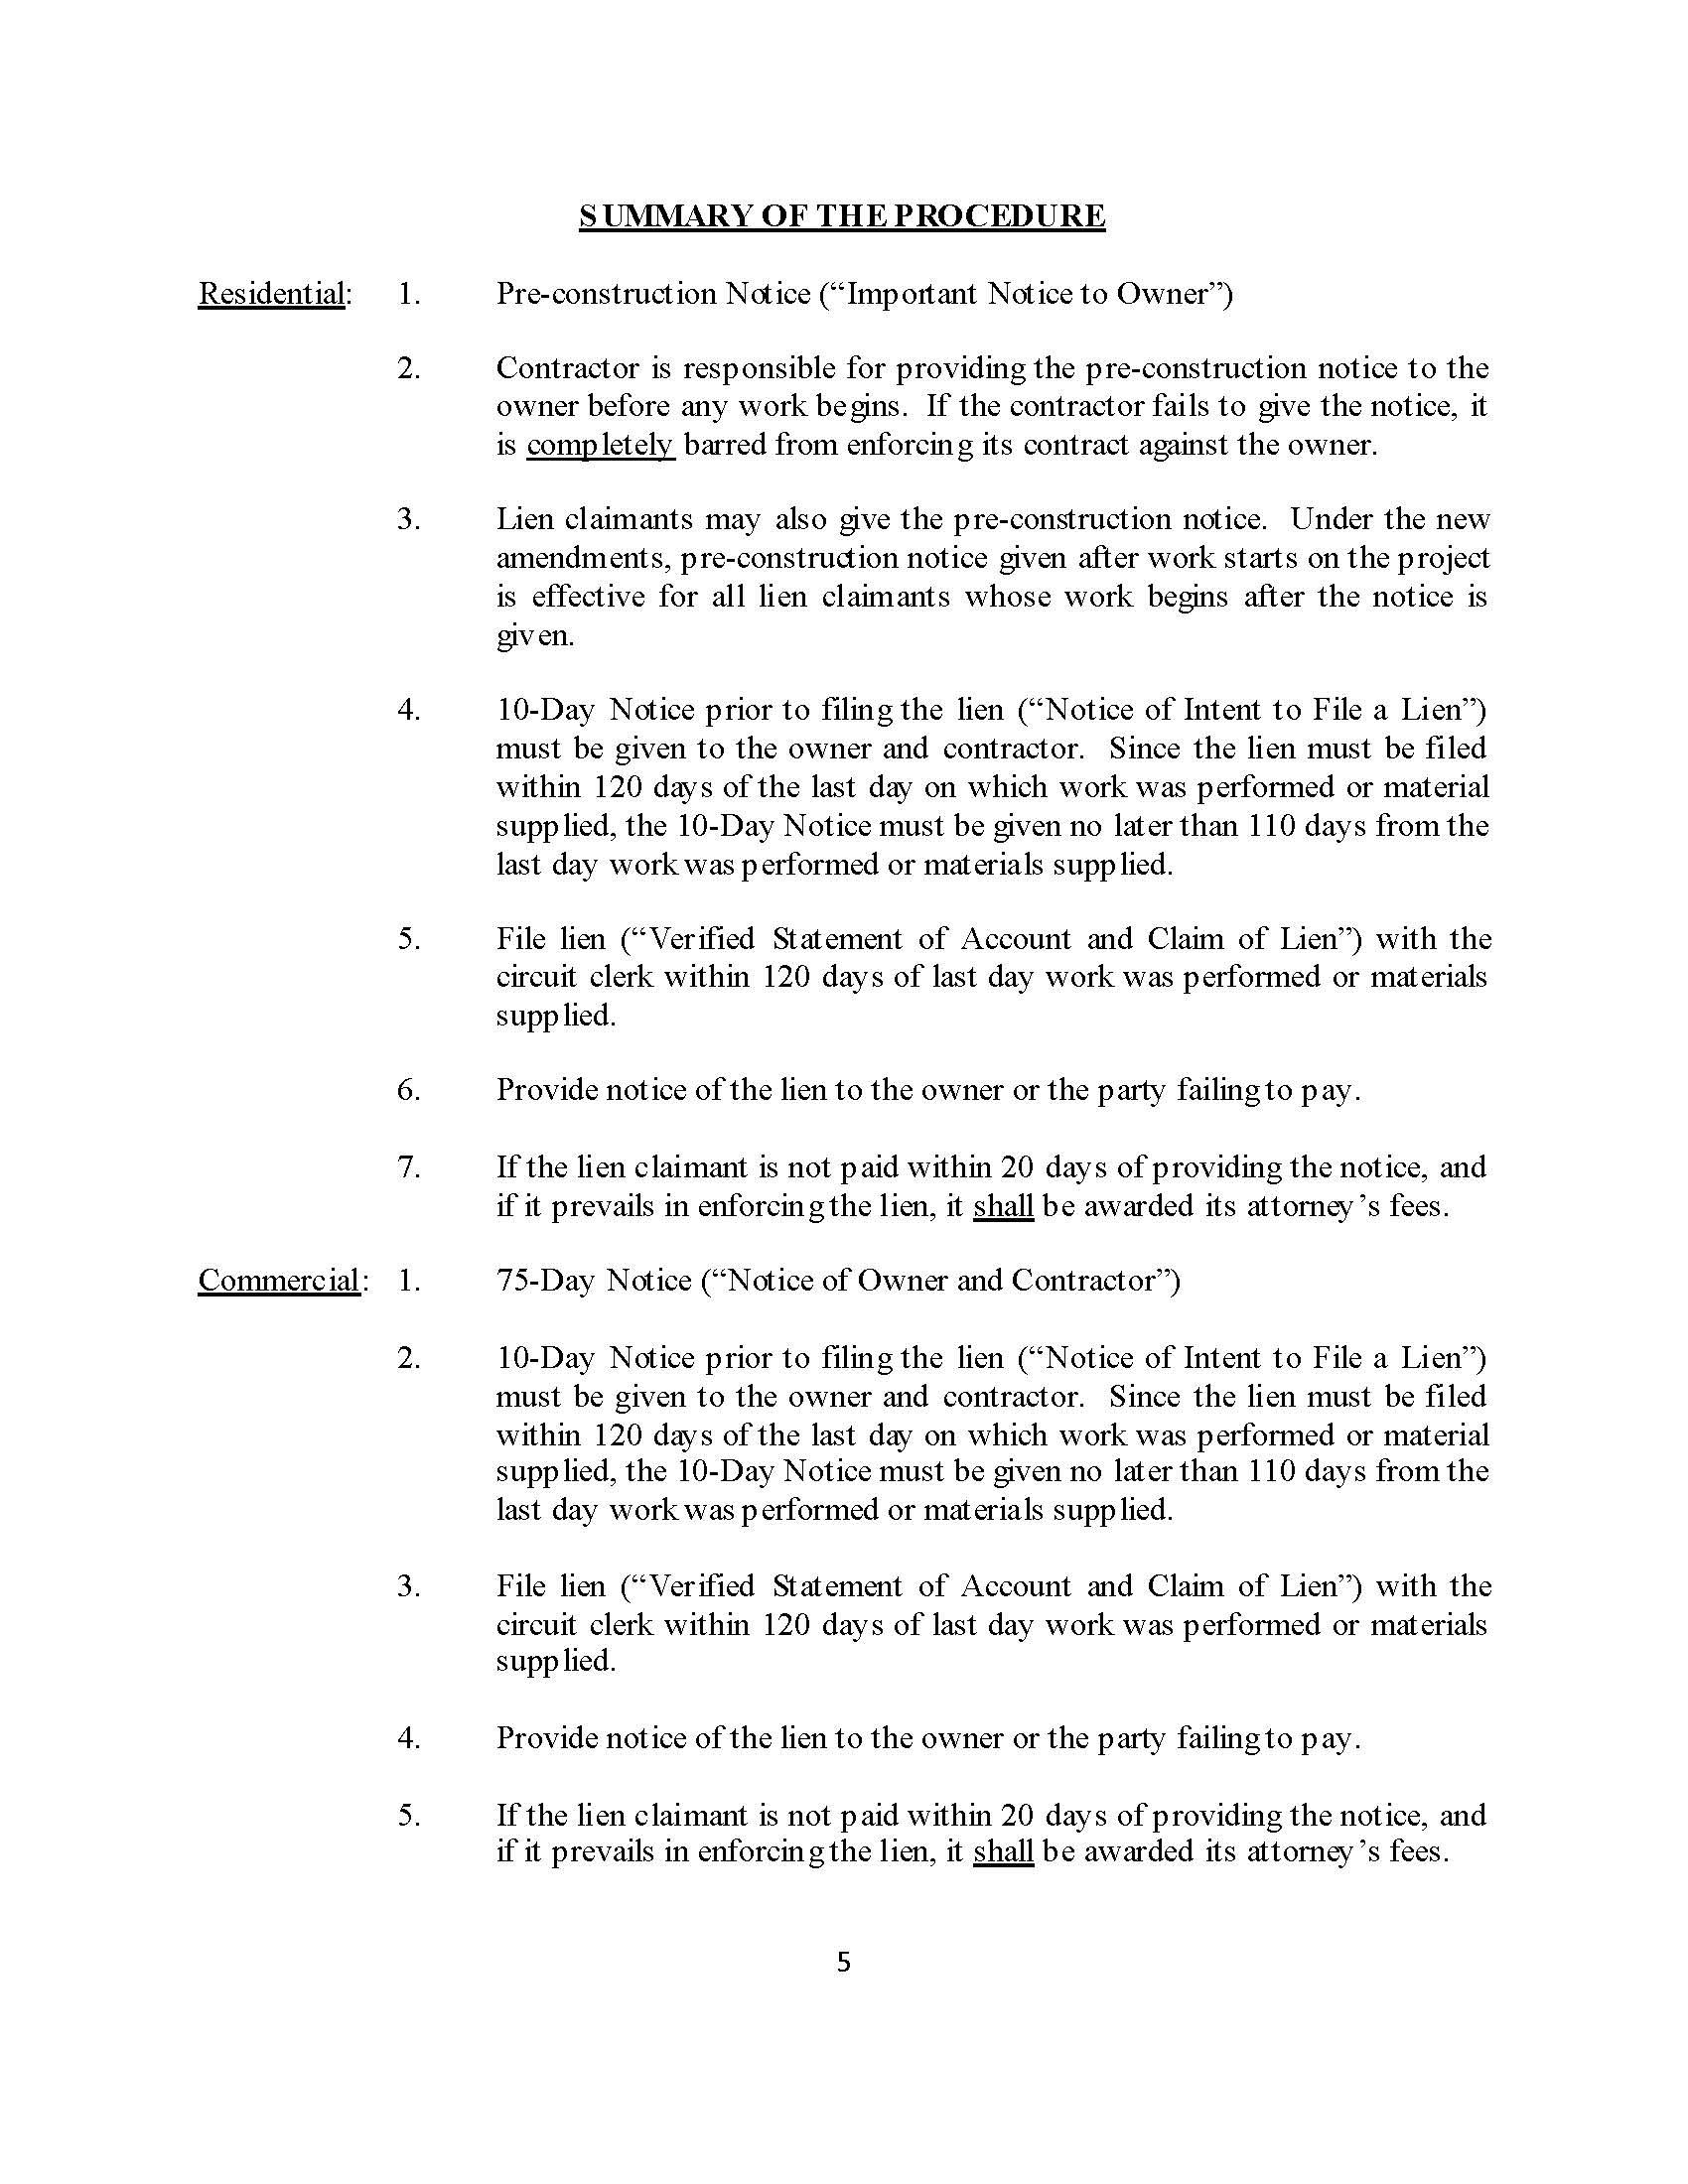 Summary-Materialman-Lien-Statutes-and-Amendments-faulkner-2011_Page_5.jpg